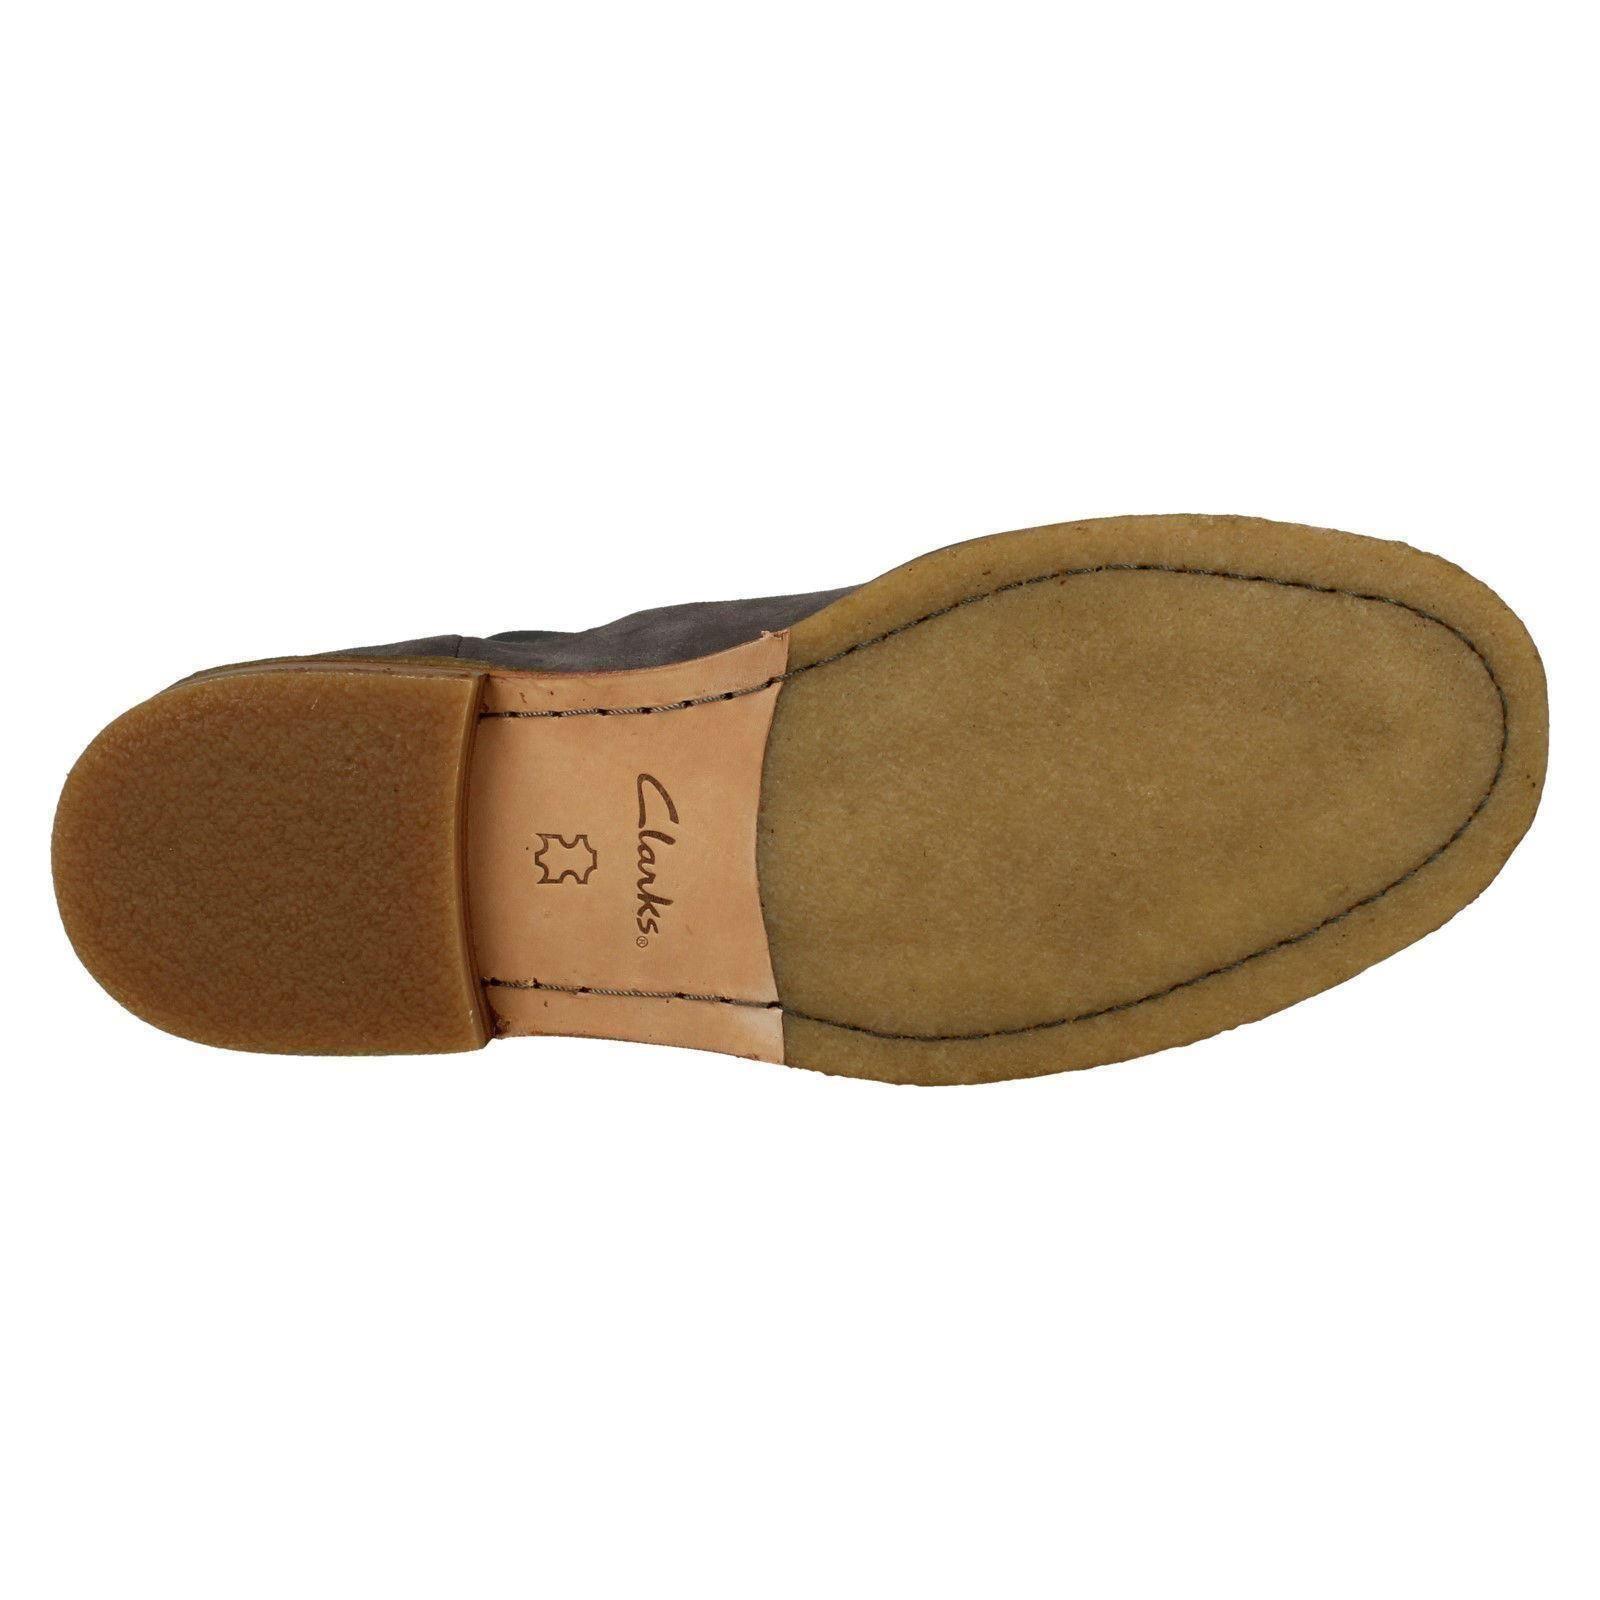 Mens Clarks Chelsea Boots /'Clarkdale Gobi/'